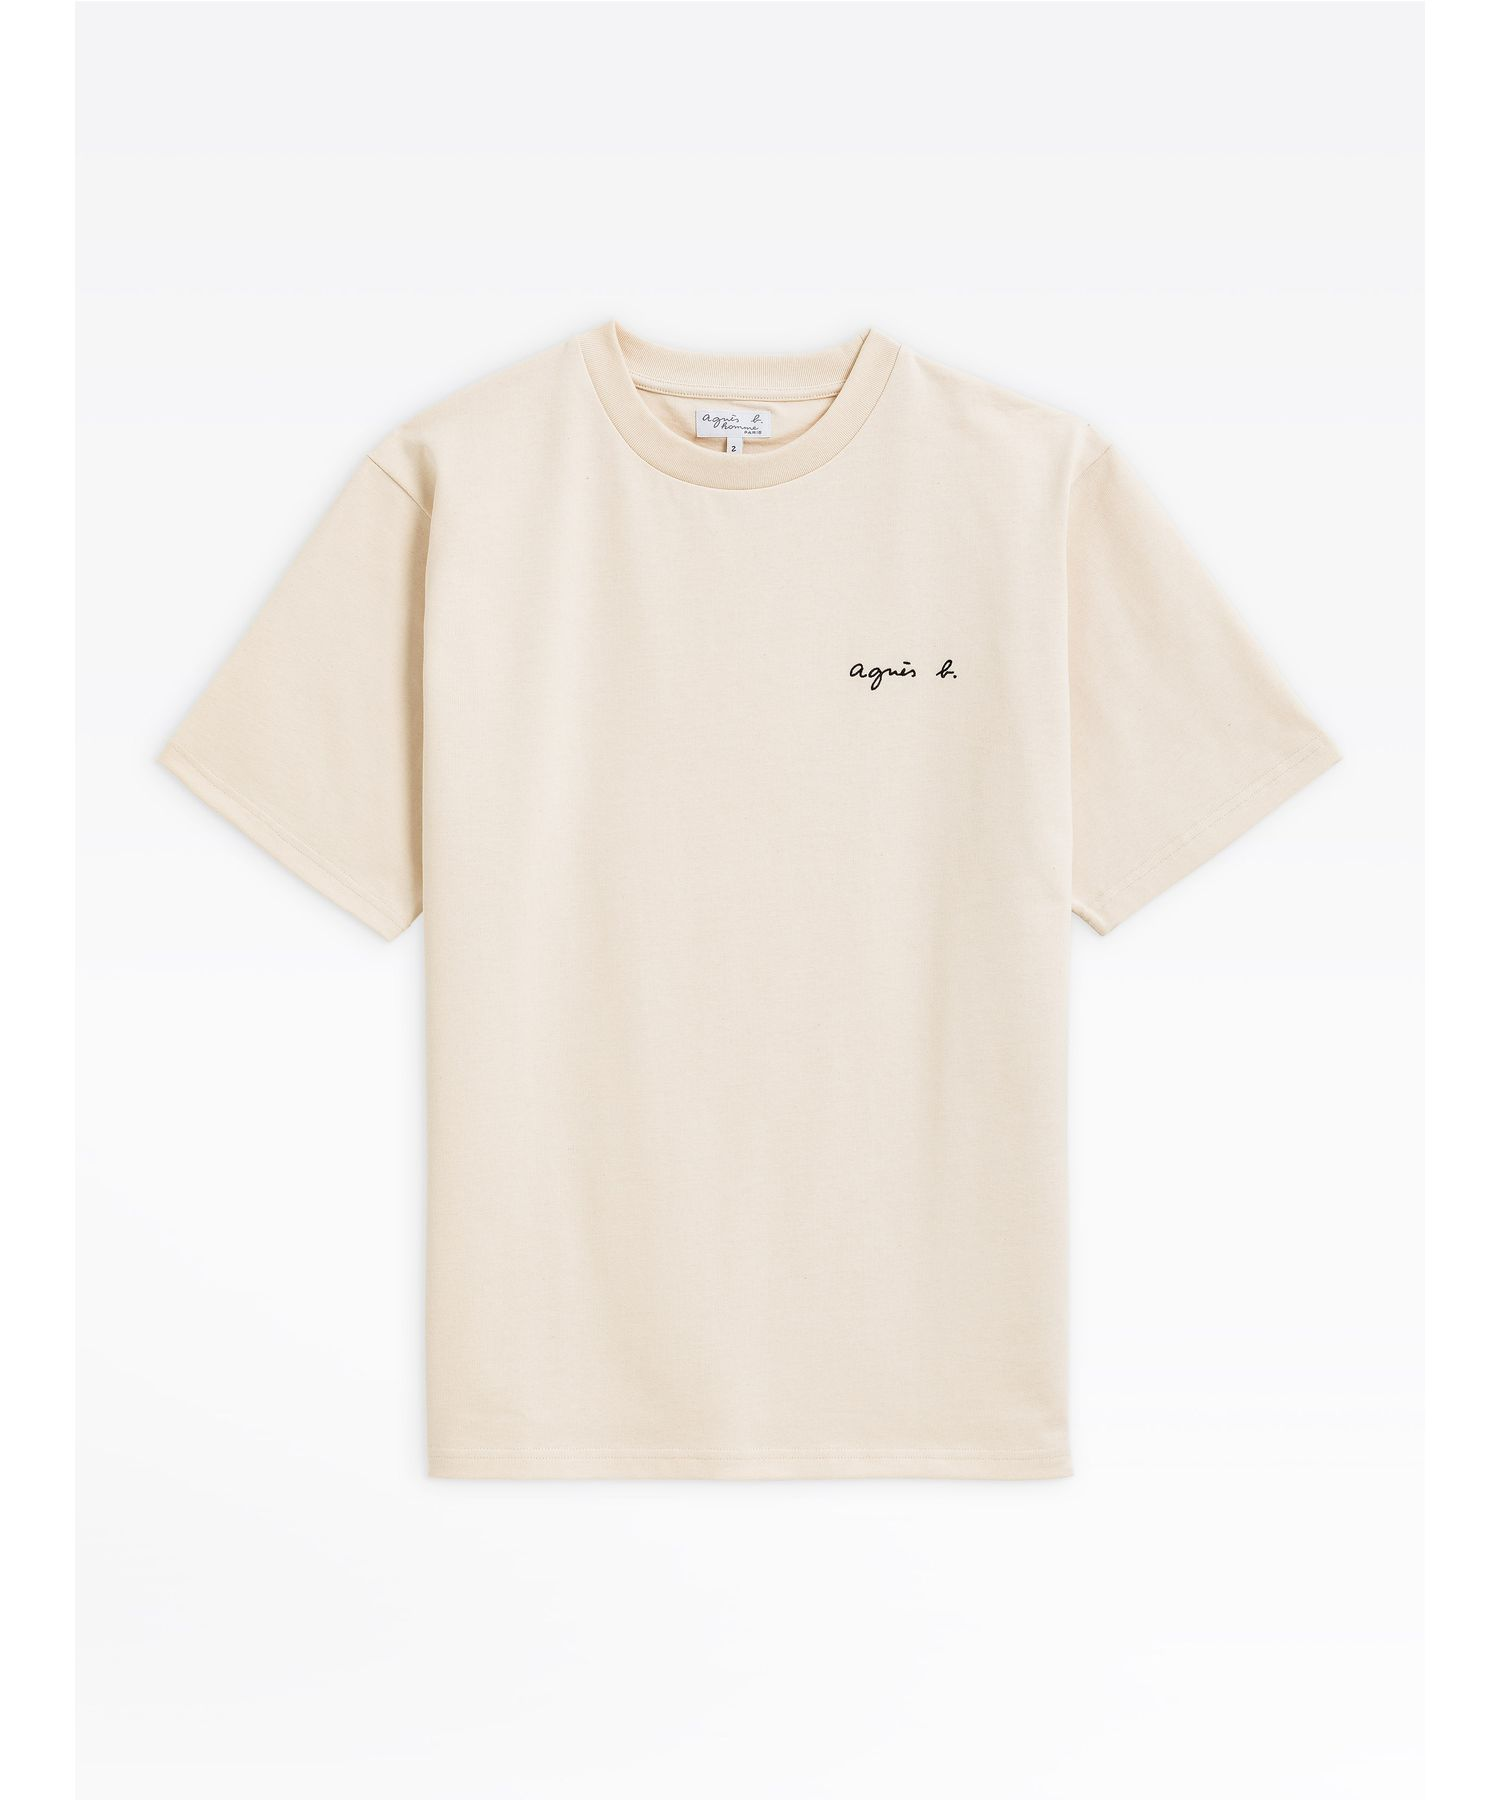 JEJ3 TS ロゴTシャツ